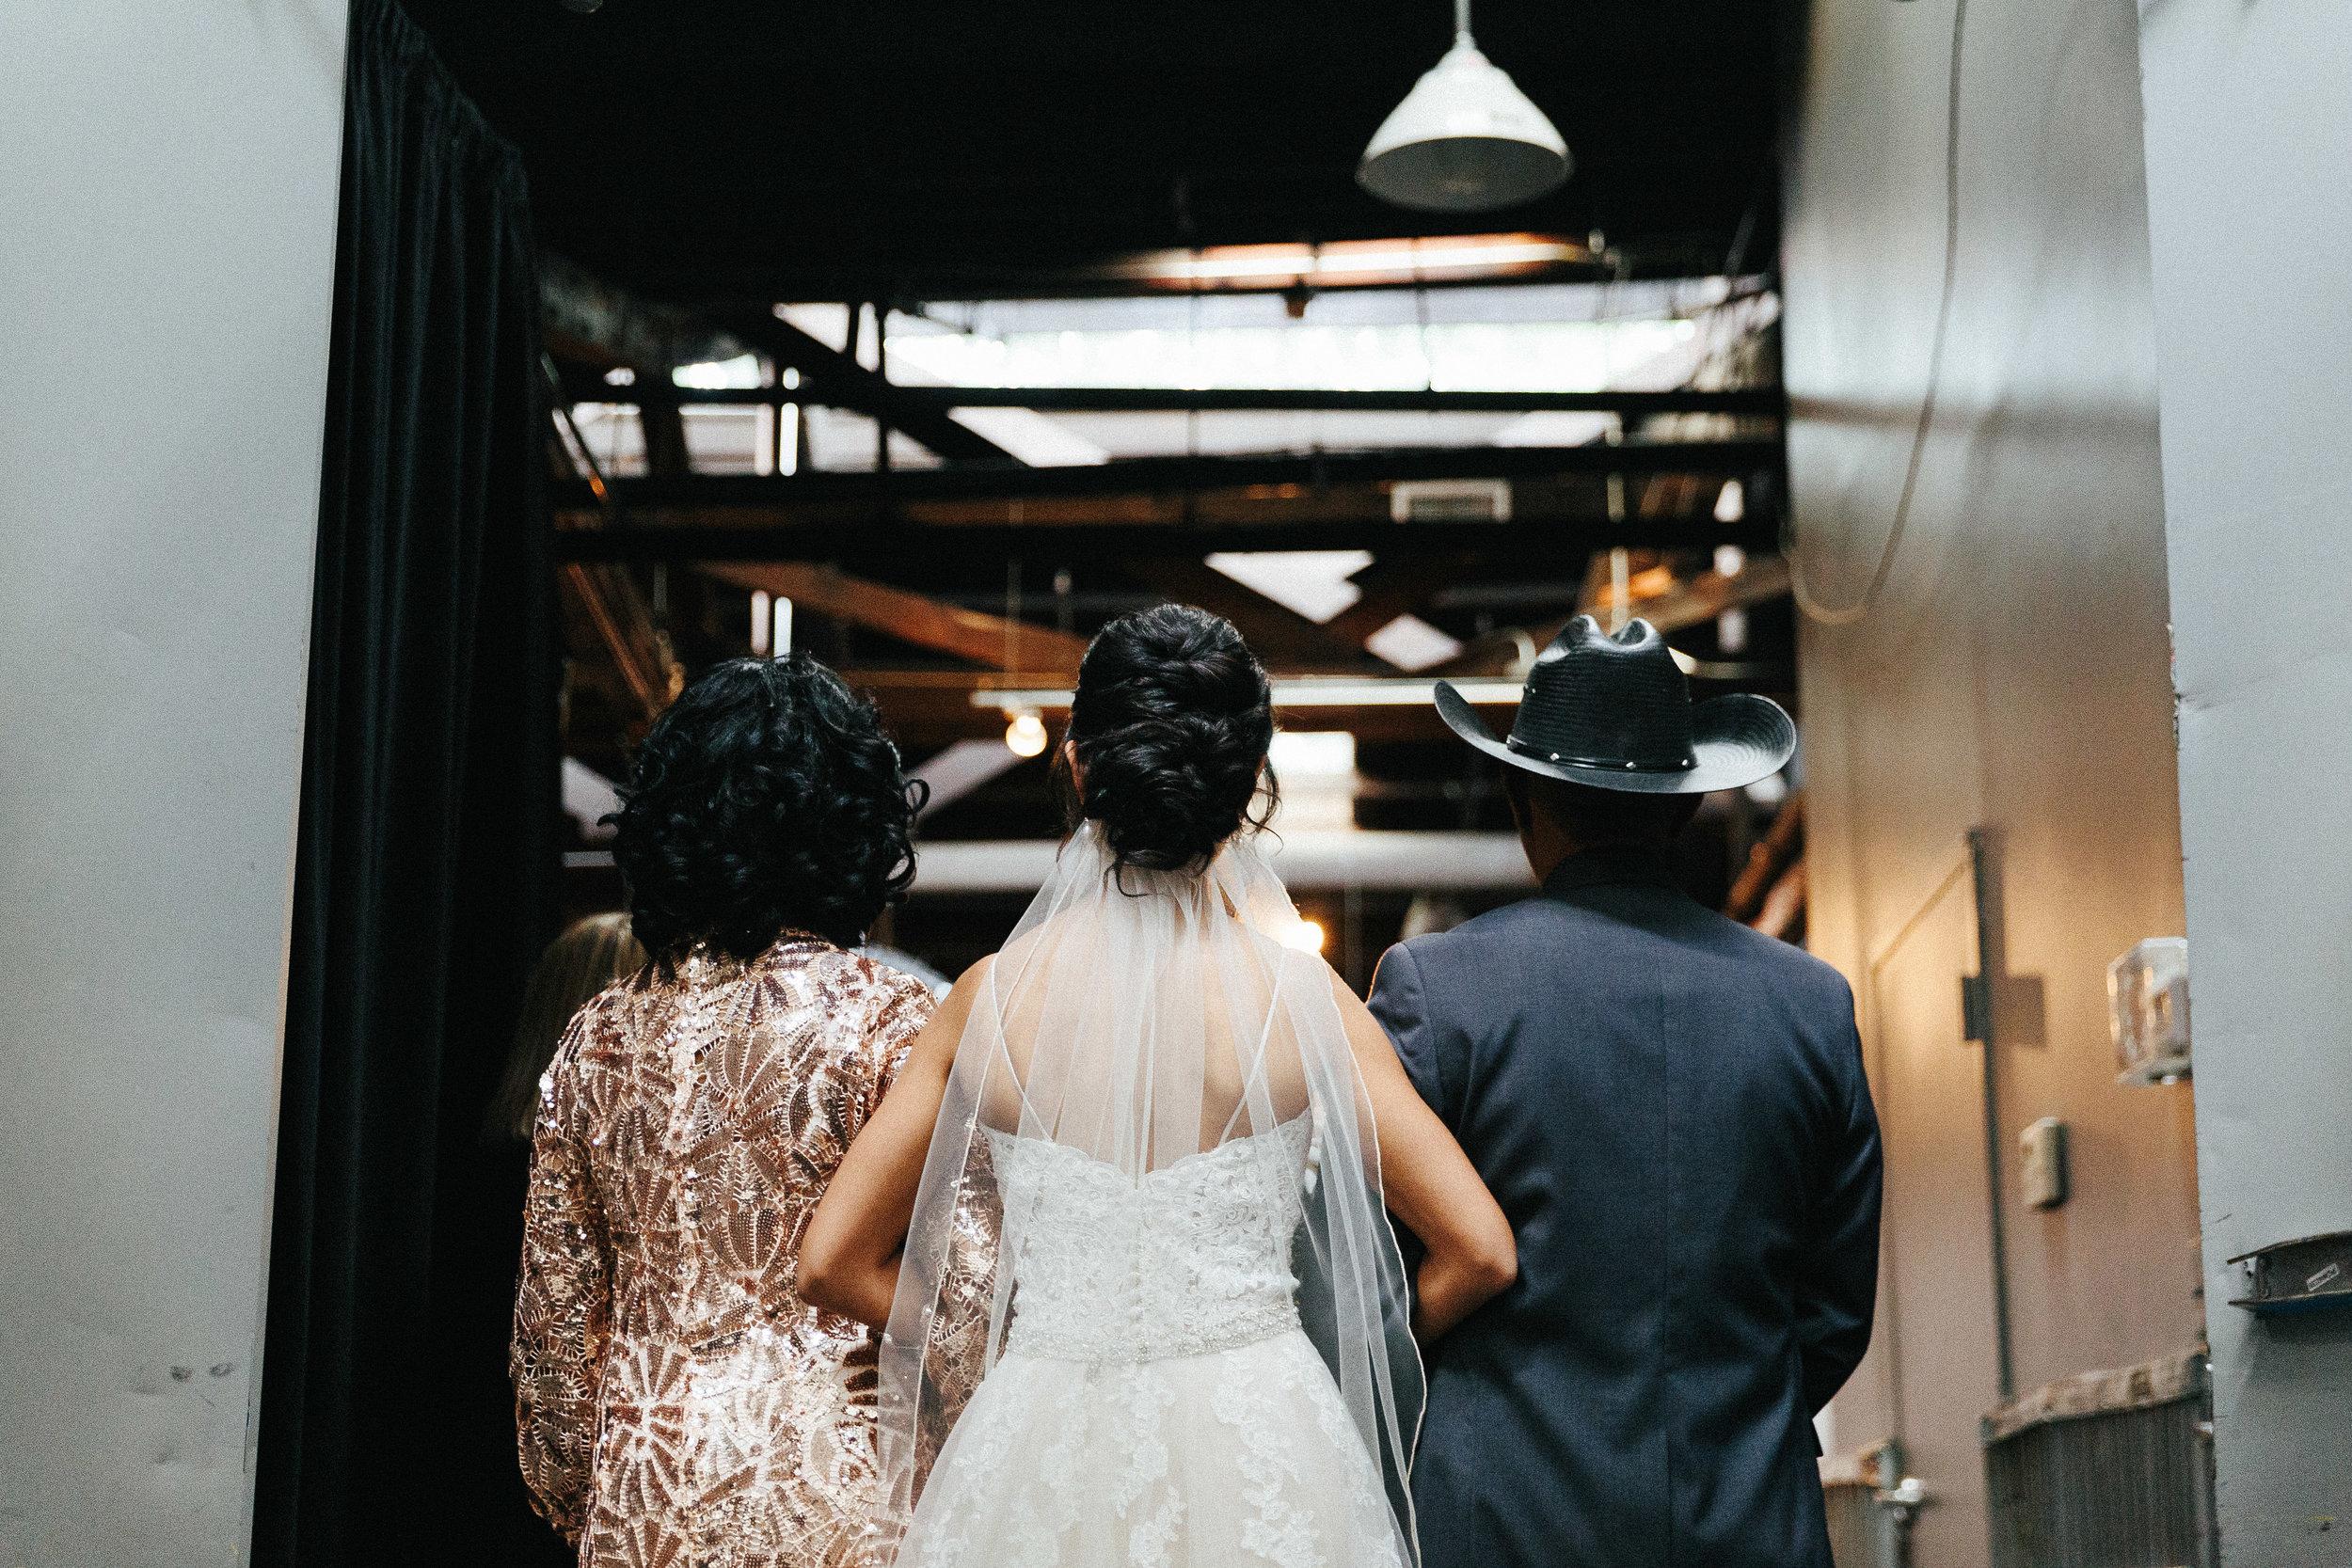 king_plow_atlanta_wedding_art_gallery_modern_lifestyle_documentary_1461.jpg